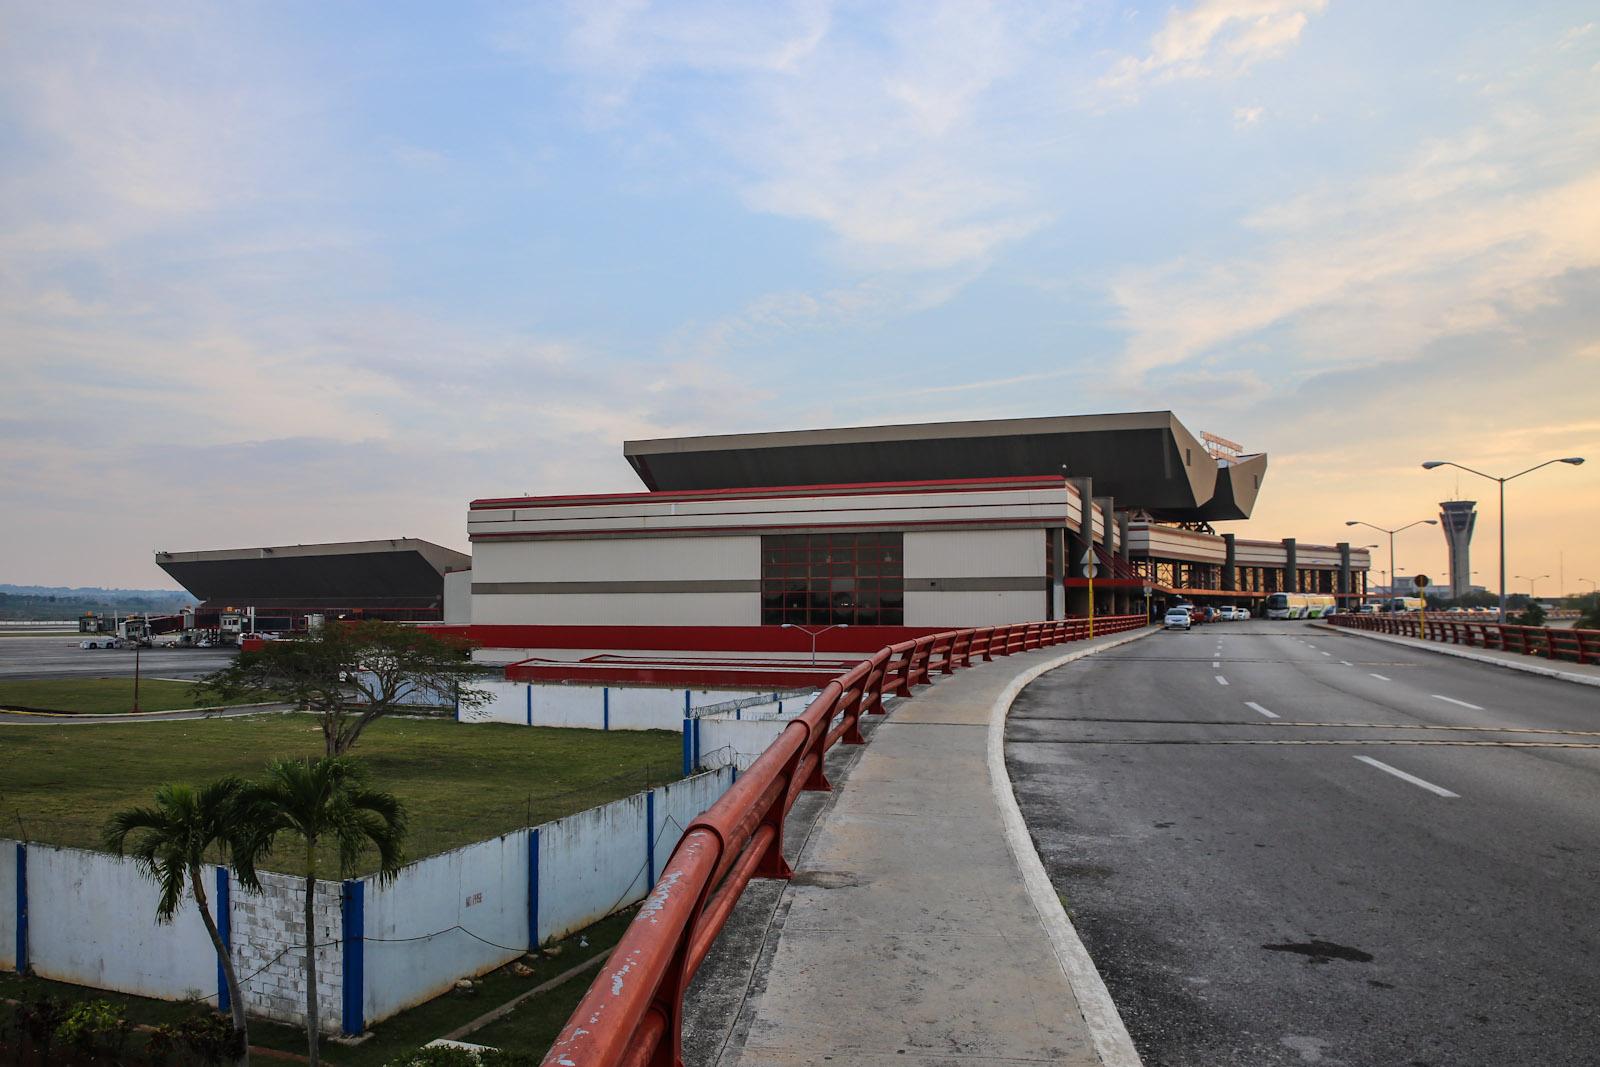 Международный терминал 3 аэропорта Гавана Хосе Марти